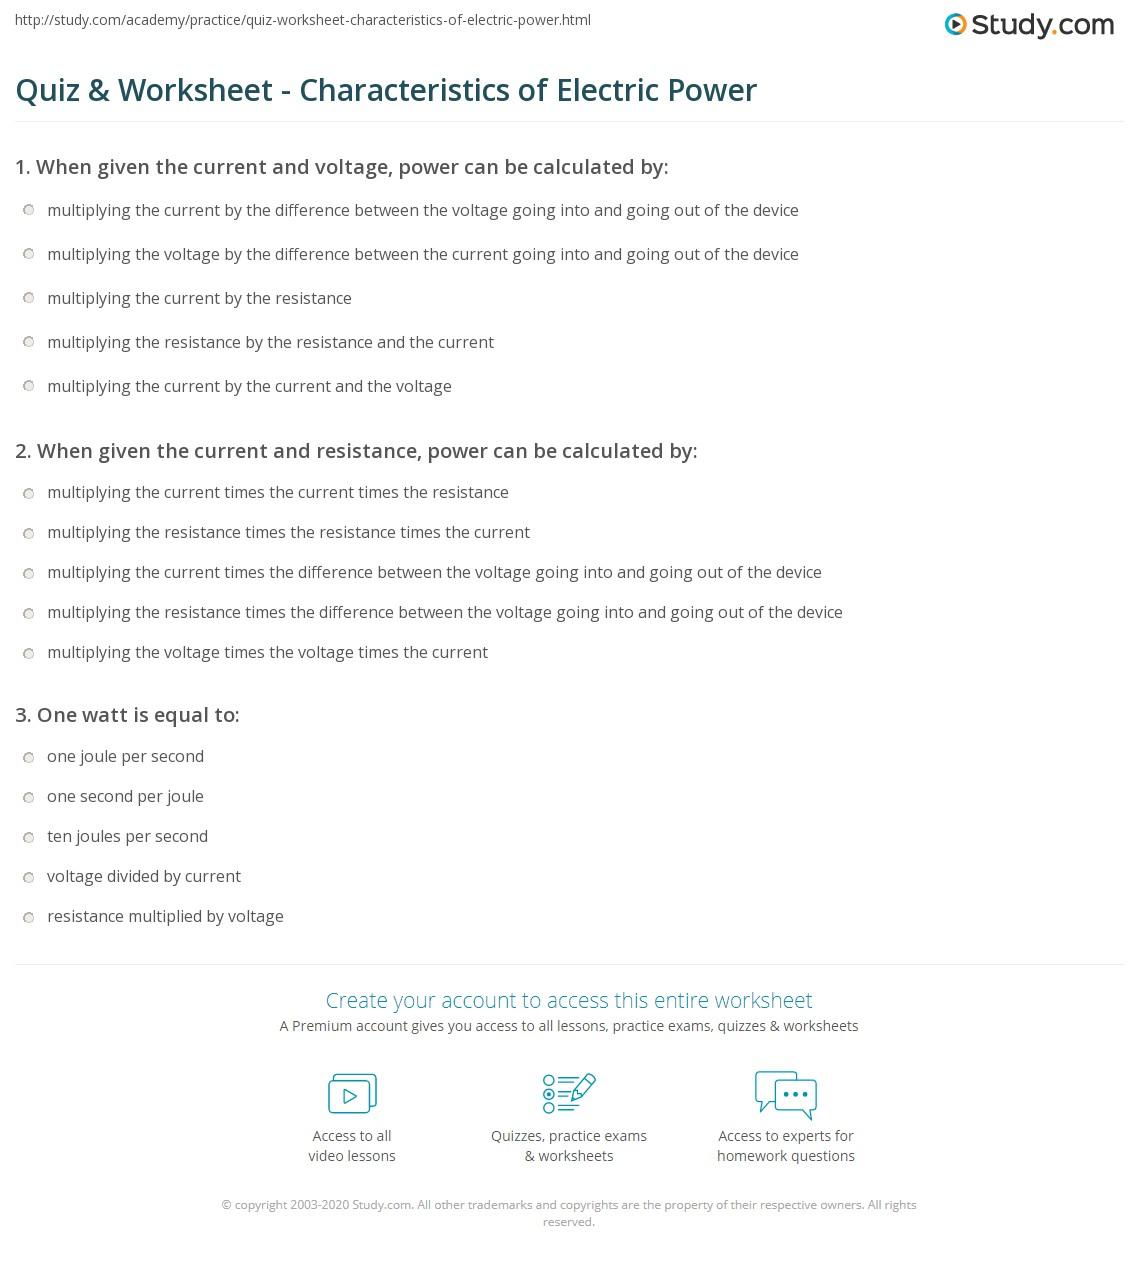 worksheet Power Worksheet quiz worksheet characteristics of electric power study com print what is worksheet